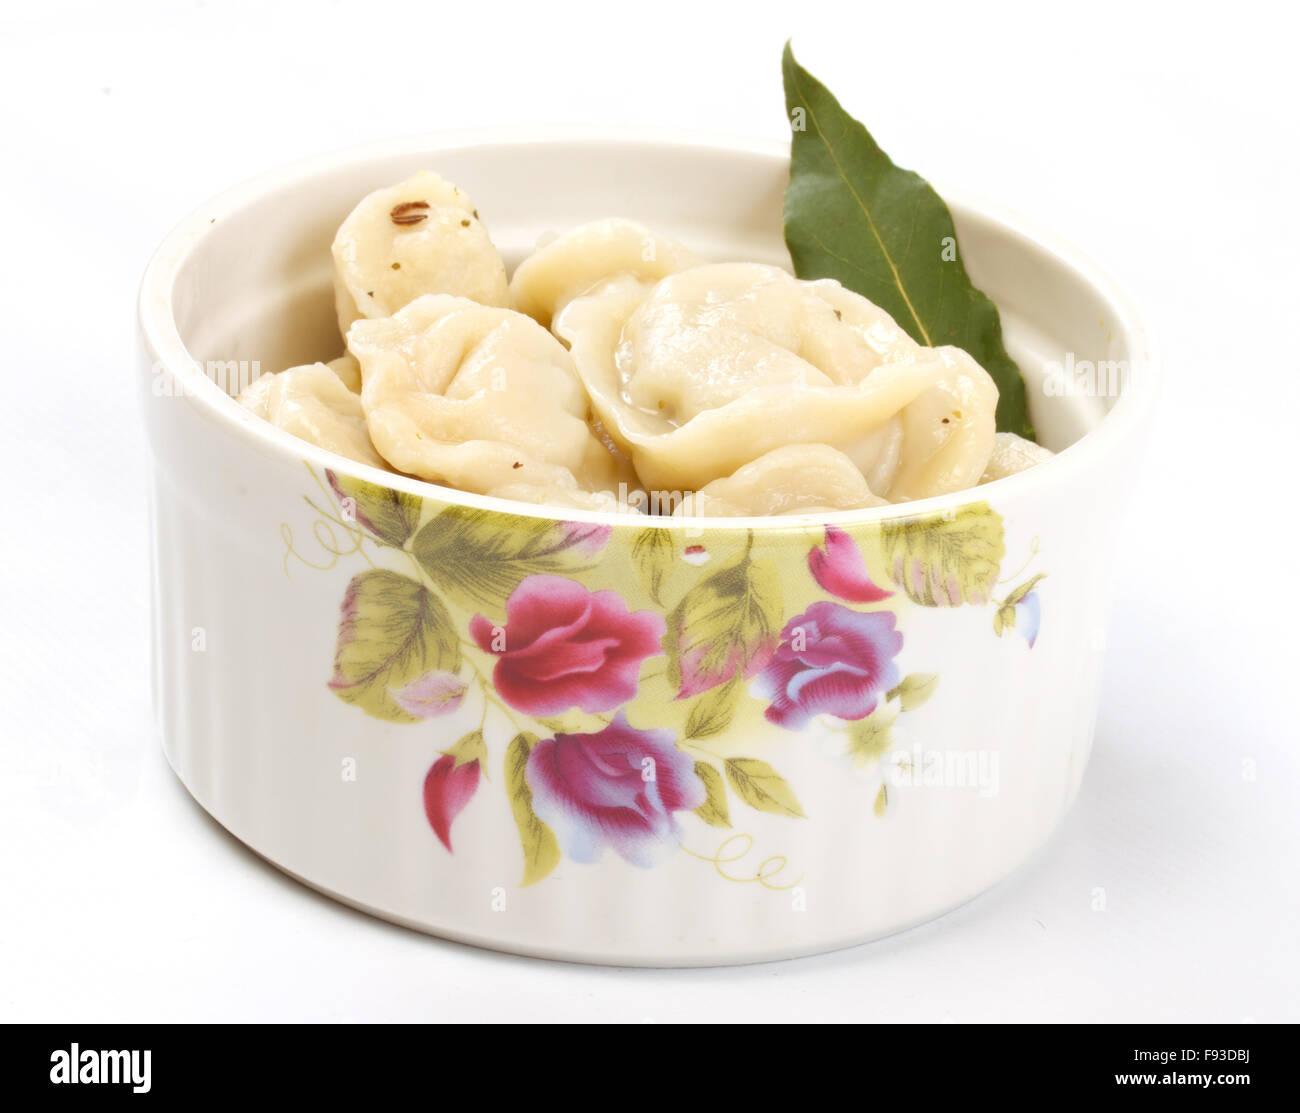 how to make russian meat dumplings